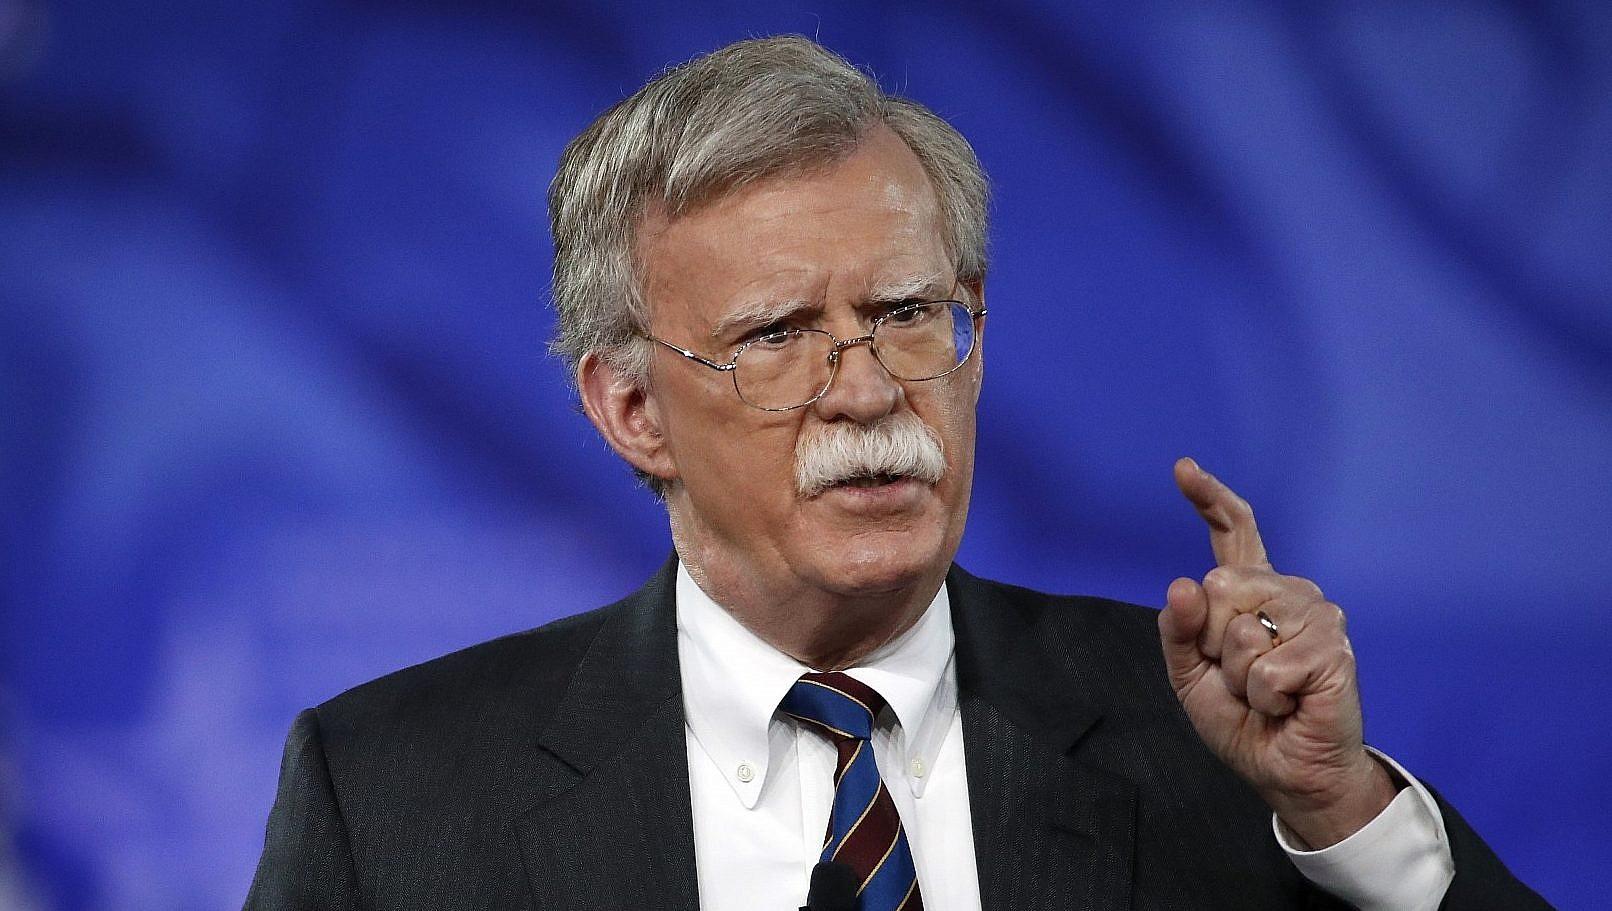 pulwama Attack, Pakistan, NSA, National Security Advisor, John Bolton, America, Ajit Doval, america News